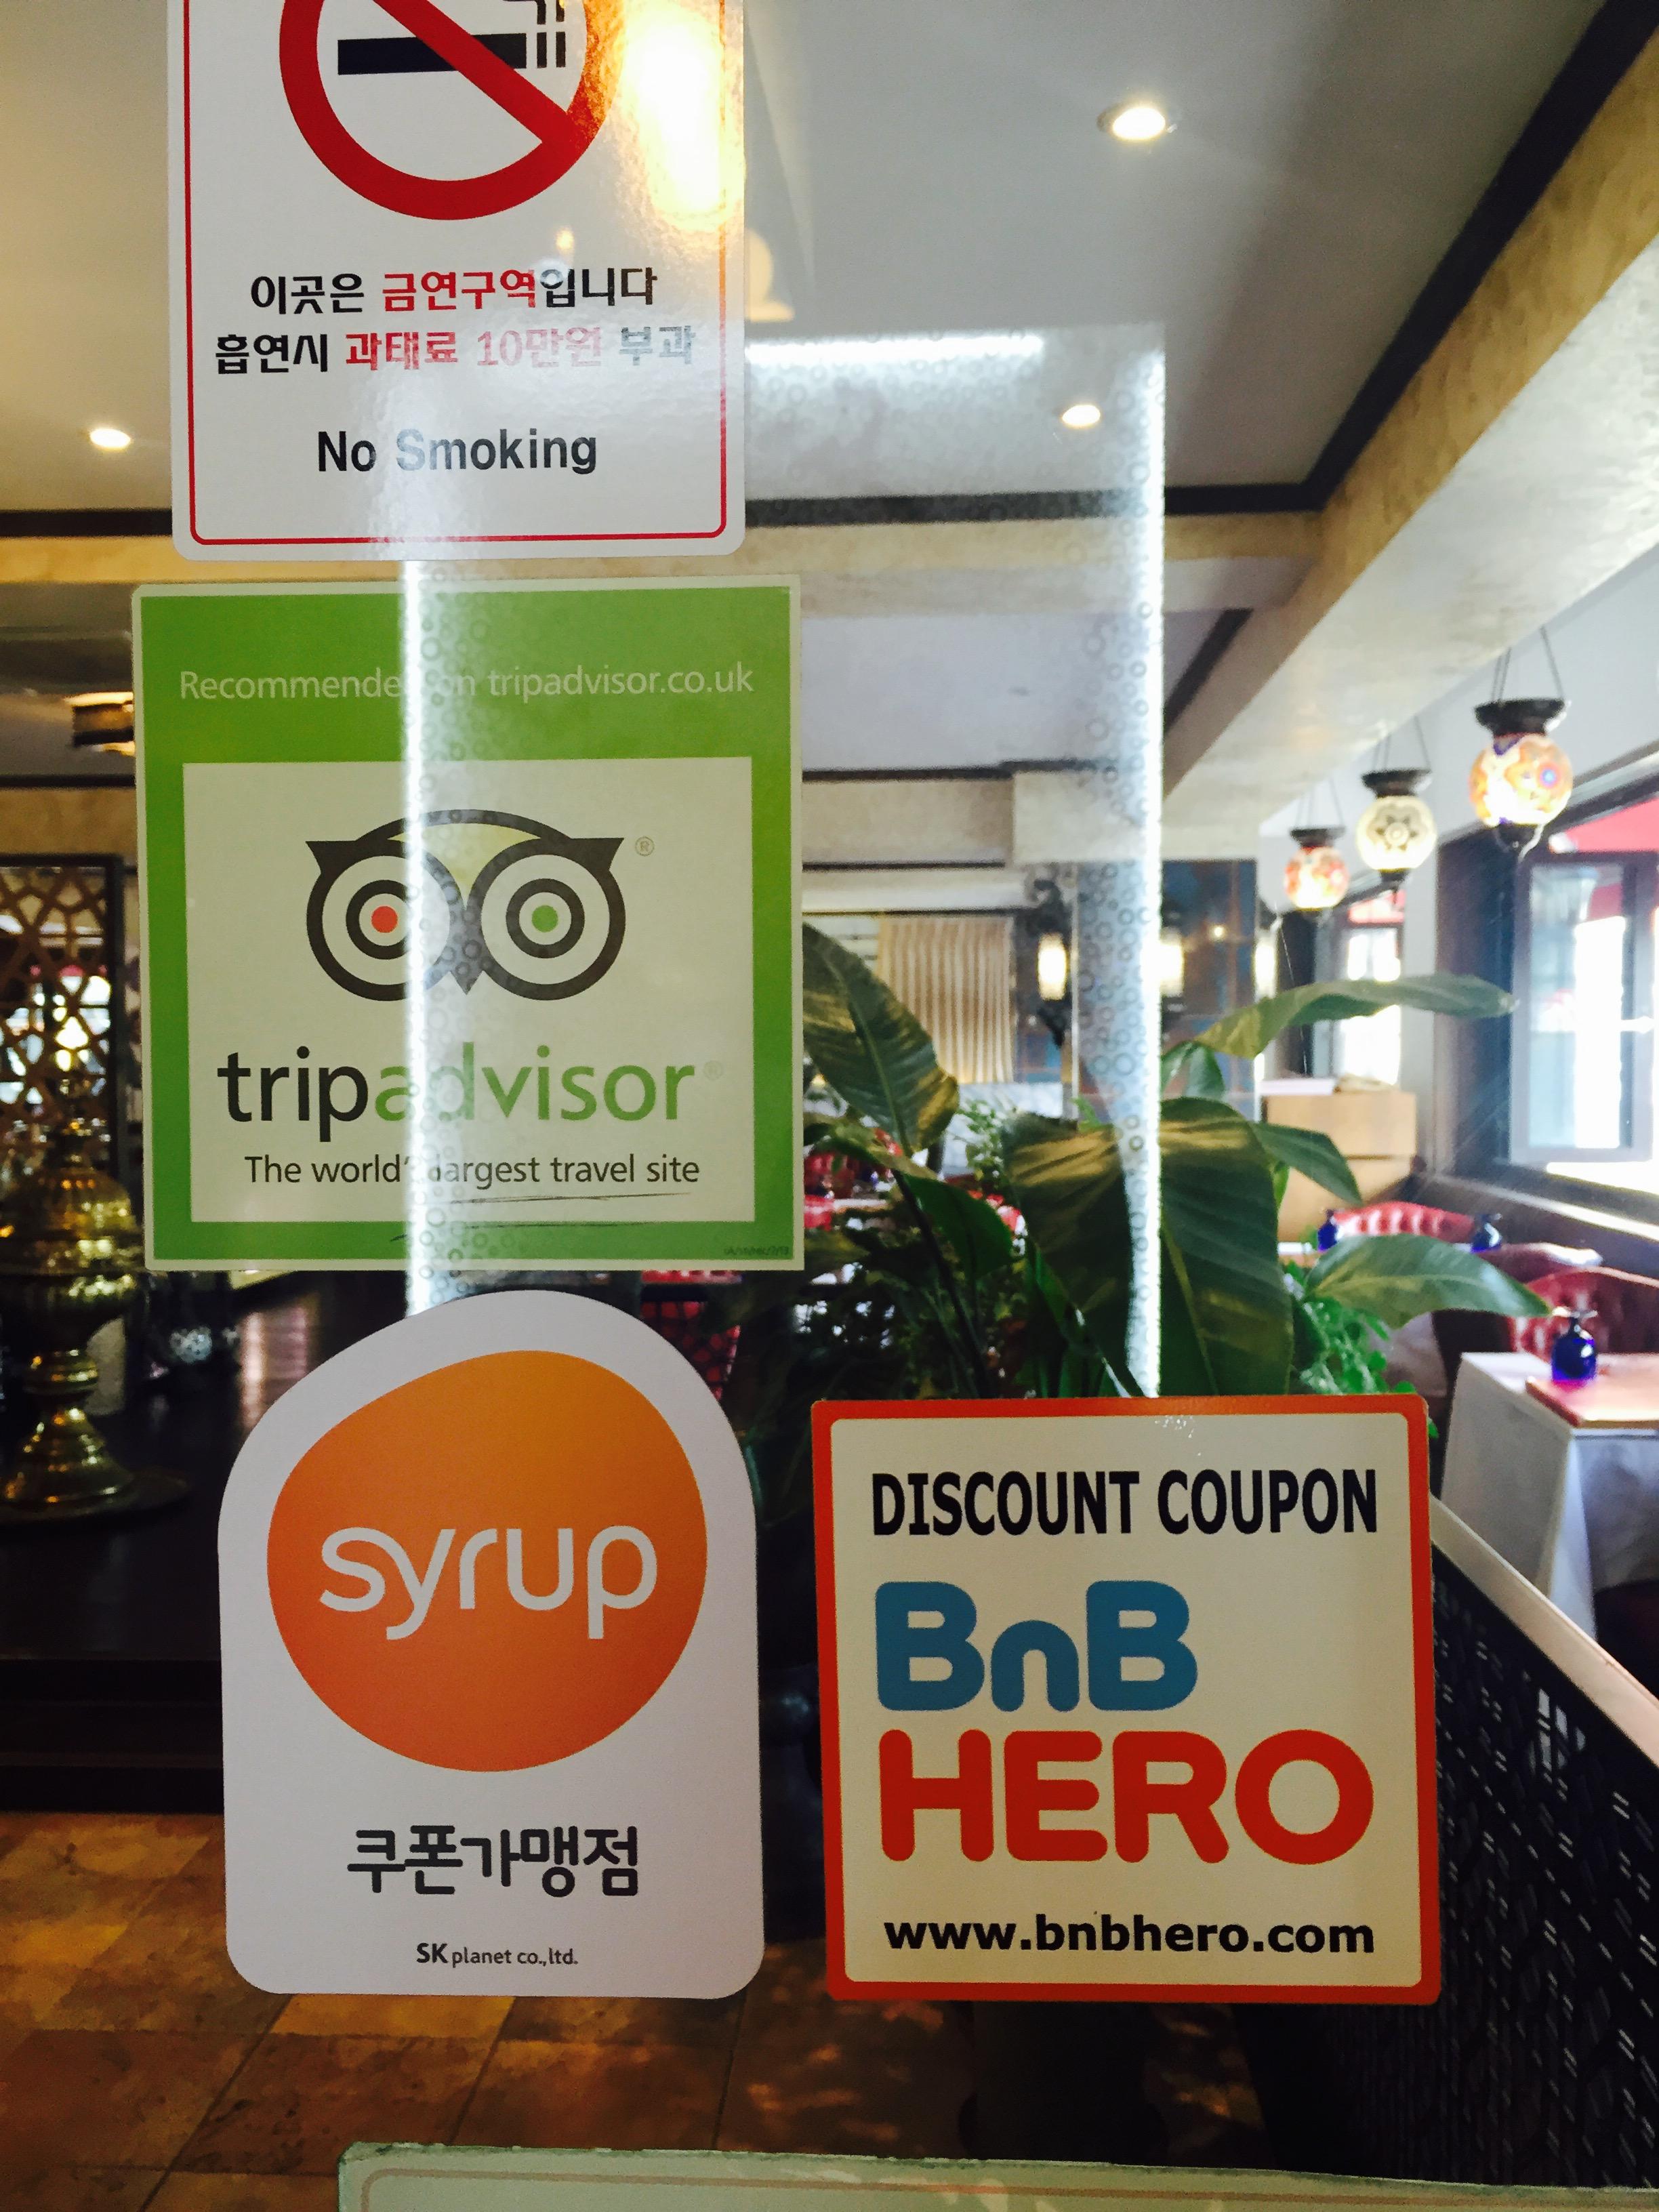 Fine Turkish Restaurant in Seoul – Pasha